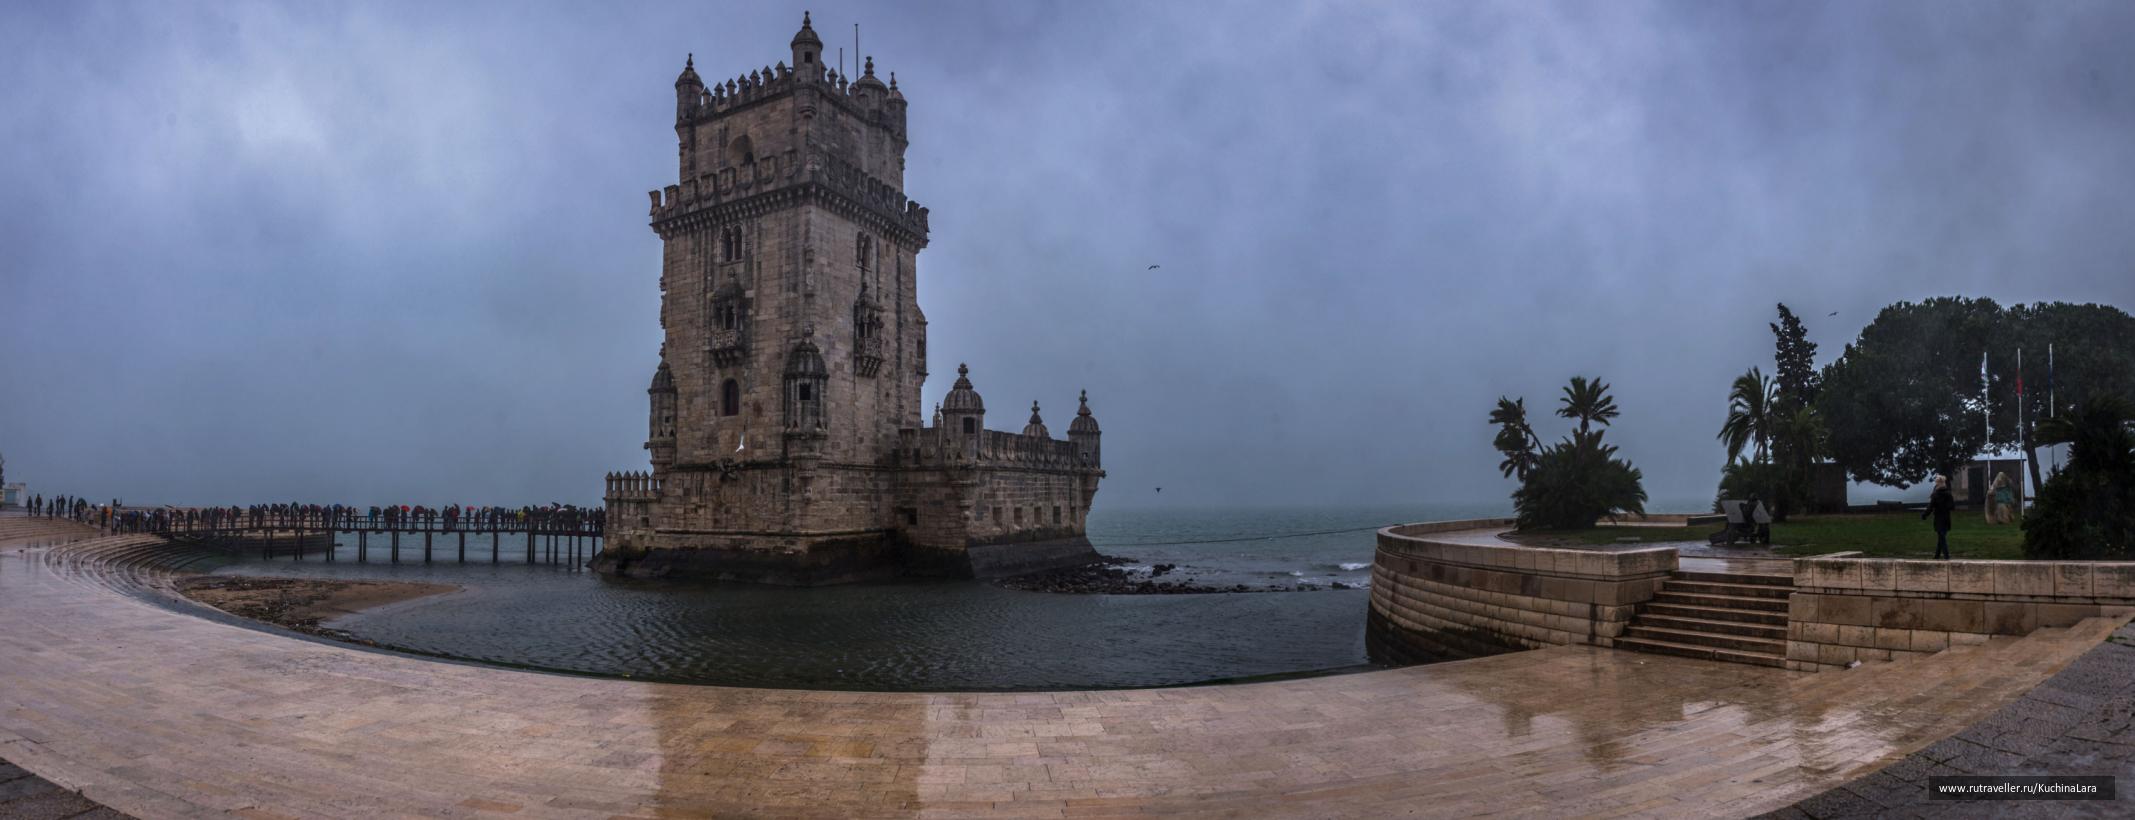 Lisboa-0148 Panorama